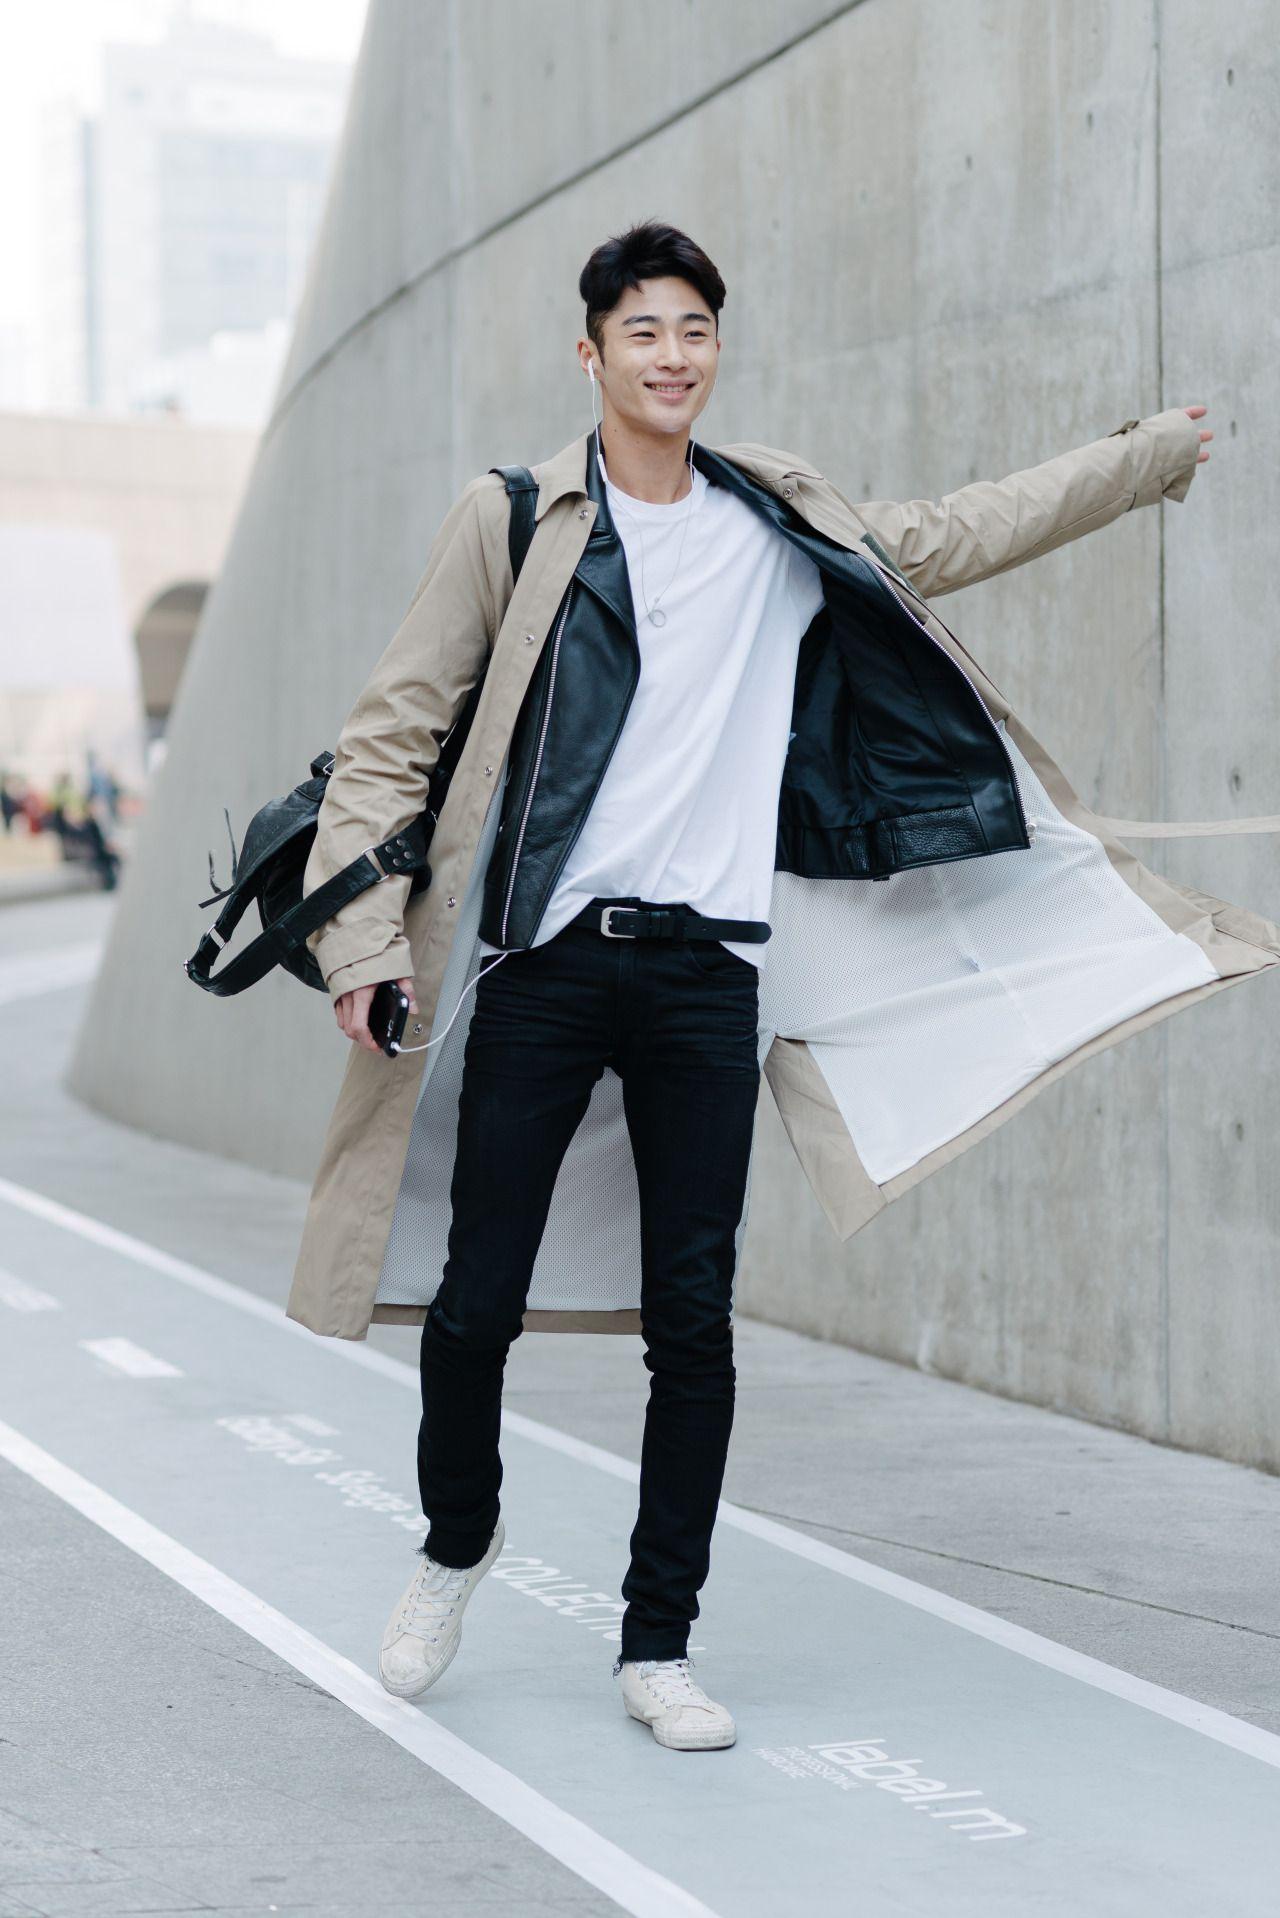 Pin by spree.co.za on Life looks stylish  Asian men fashion